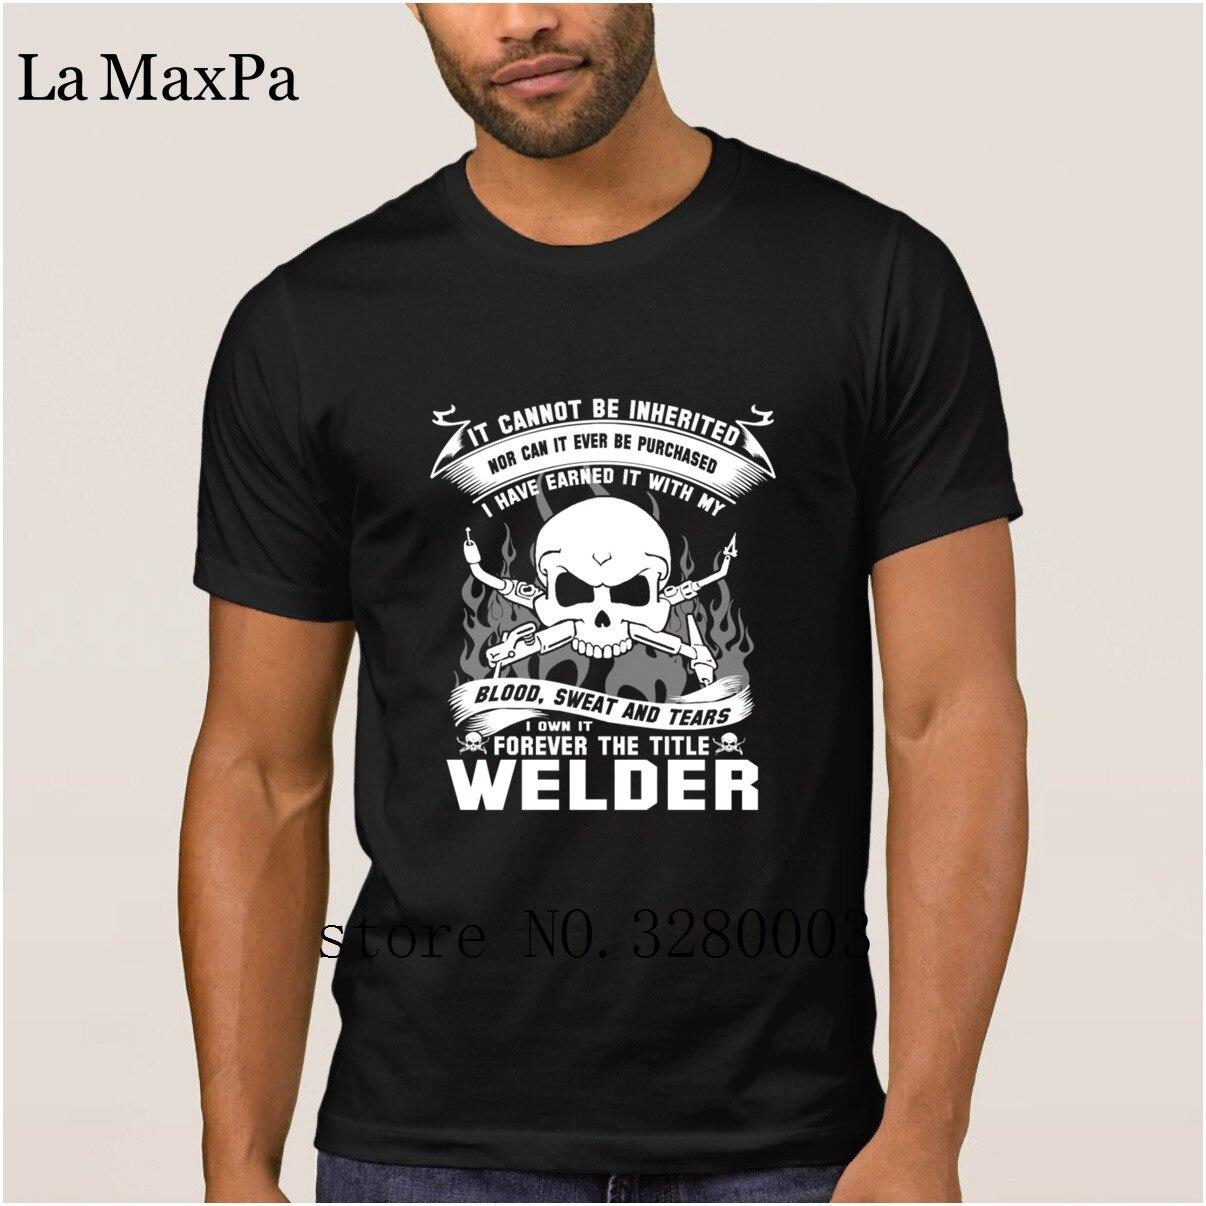 Full Size of T Shirt Witzige Sprüche T Shirt Druck Lustige Sprüche Lustige Hundesprüche Auf T Shirt Lustige Tshirt Sprüche Für Frauen Küche T Shirt Lustige Sprüche